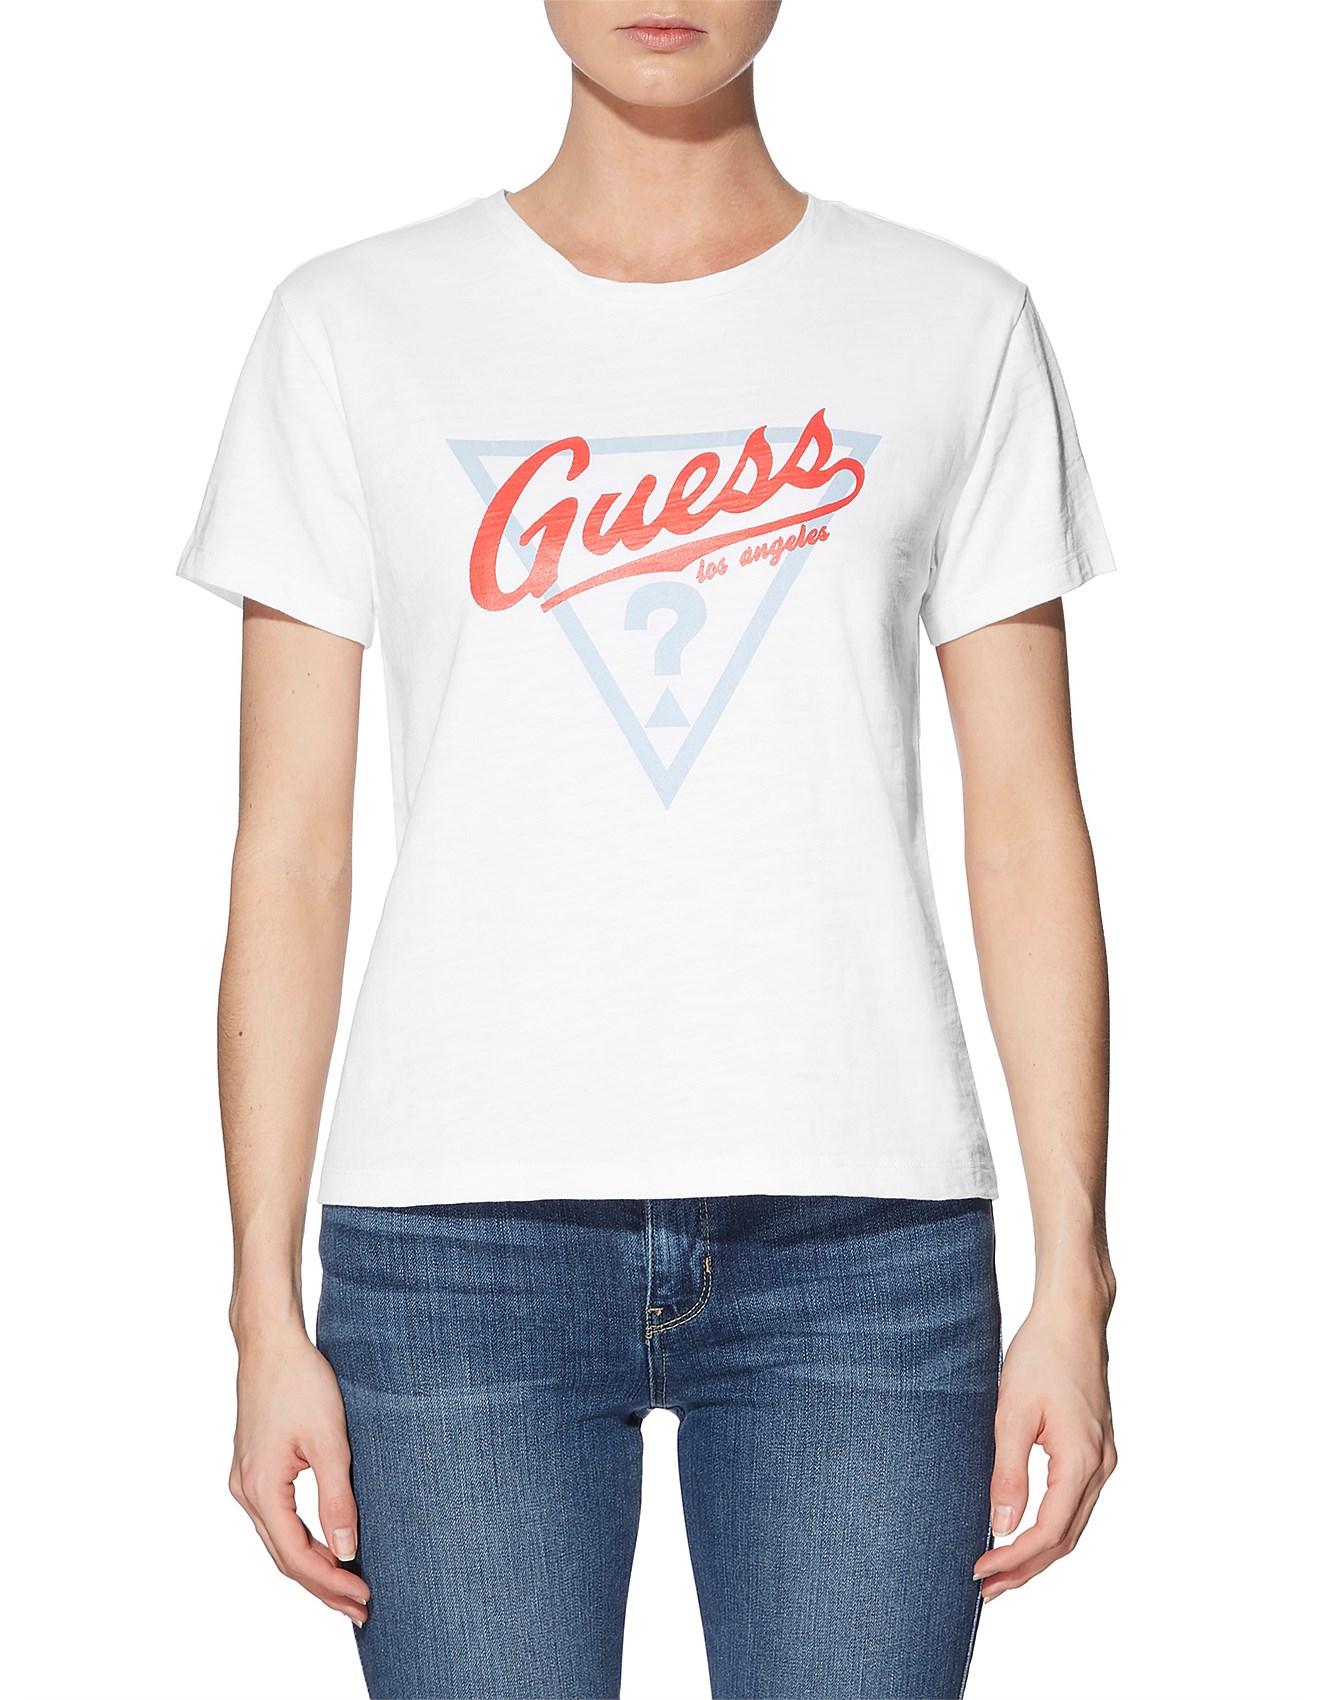 Sweatshirts Women's Jones David Ss amp; Tops T Shirts Tanks zvqwXHxrz